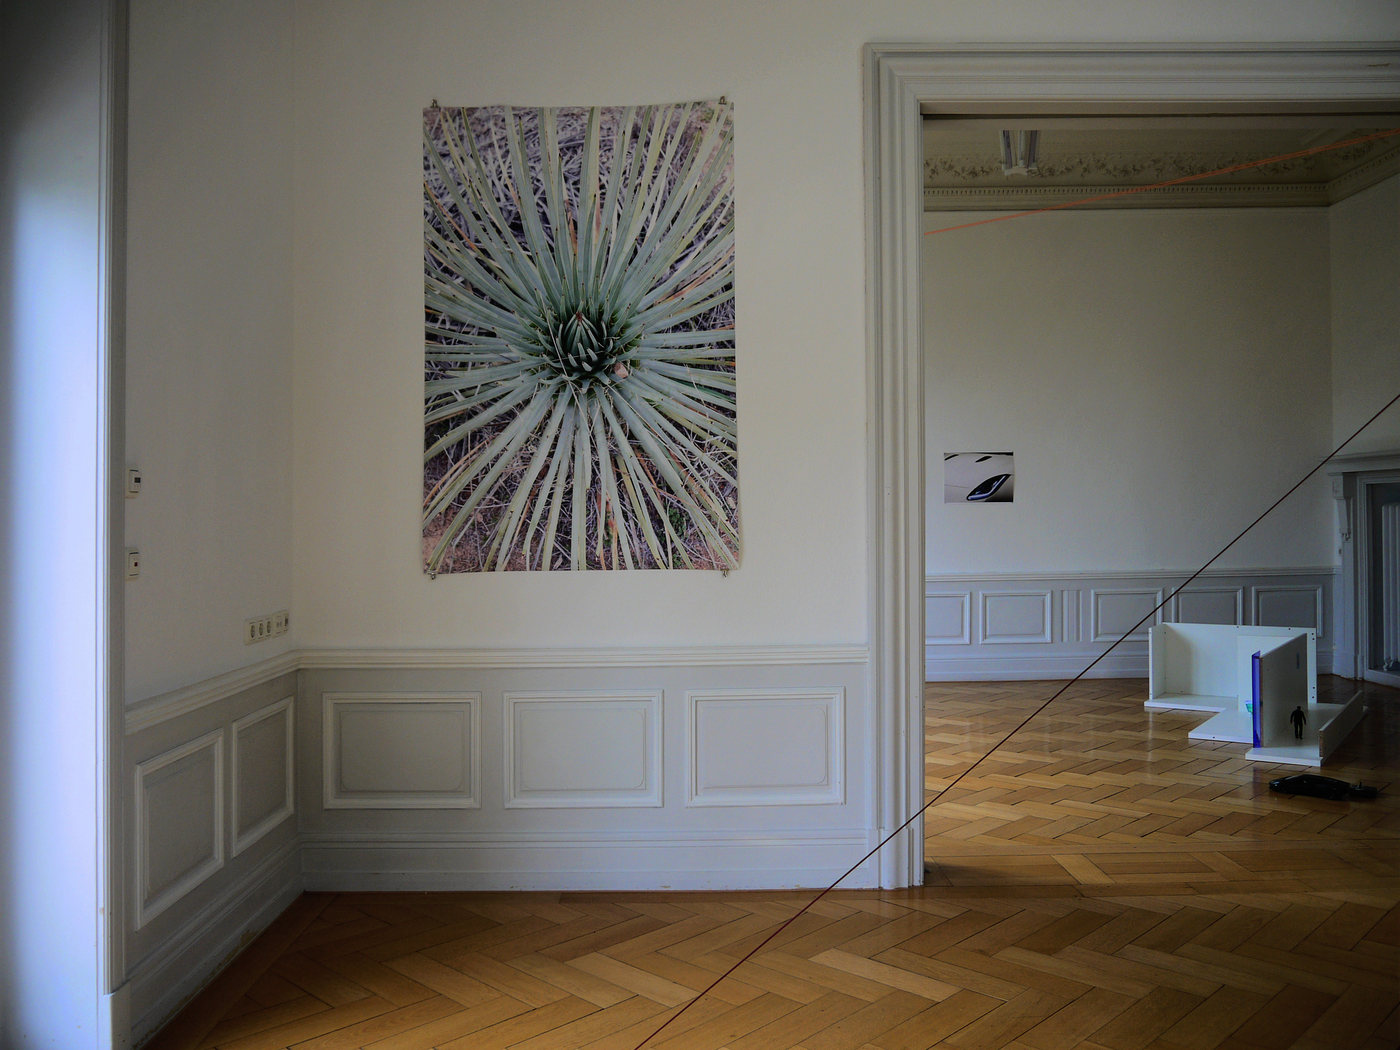 Salon Kennedy_PITFALLS_Benedikte Bjerre_Money over World_Frankfurt_Cultural Avenue_B